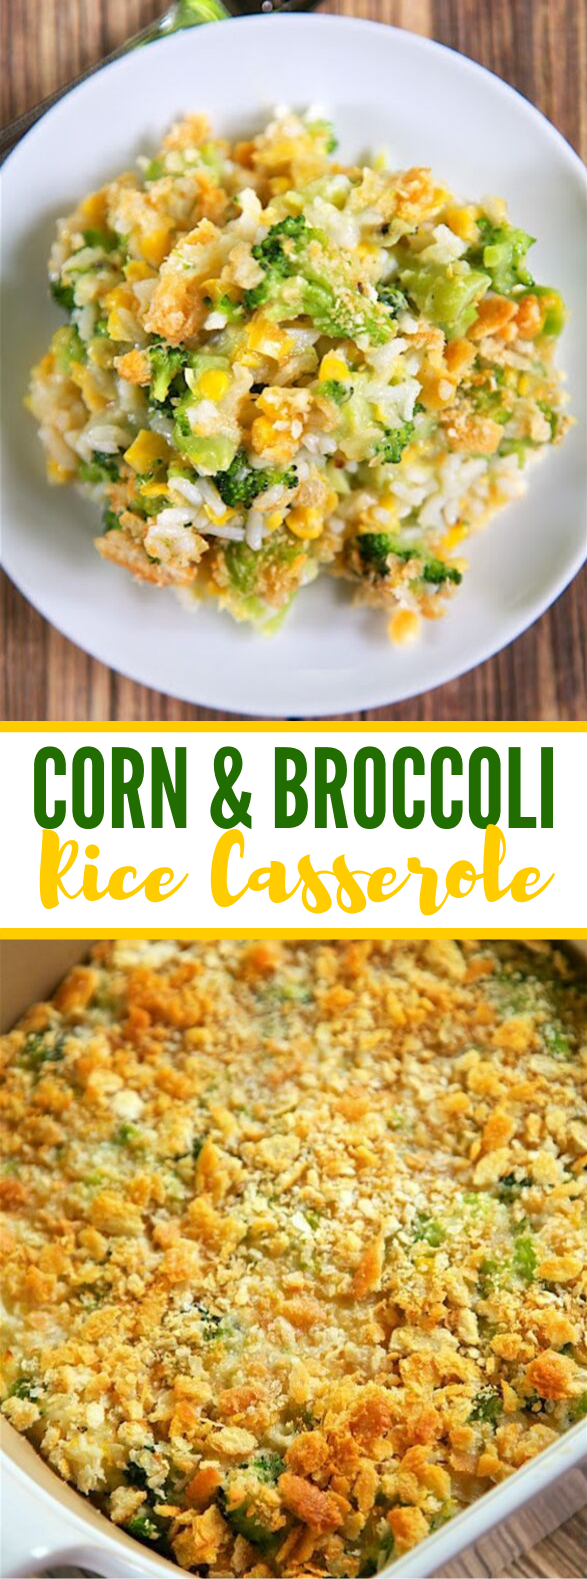 Corn and Broccoli Rice Casserole Recipe #casserole #dinner #maindish #vegetarian #easyrecipes